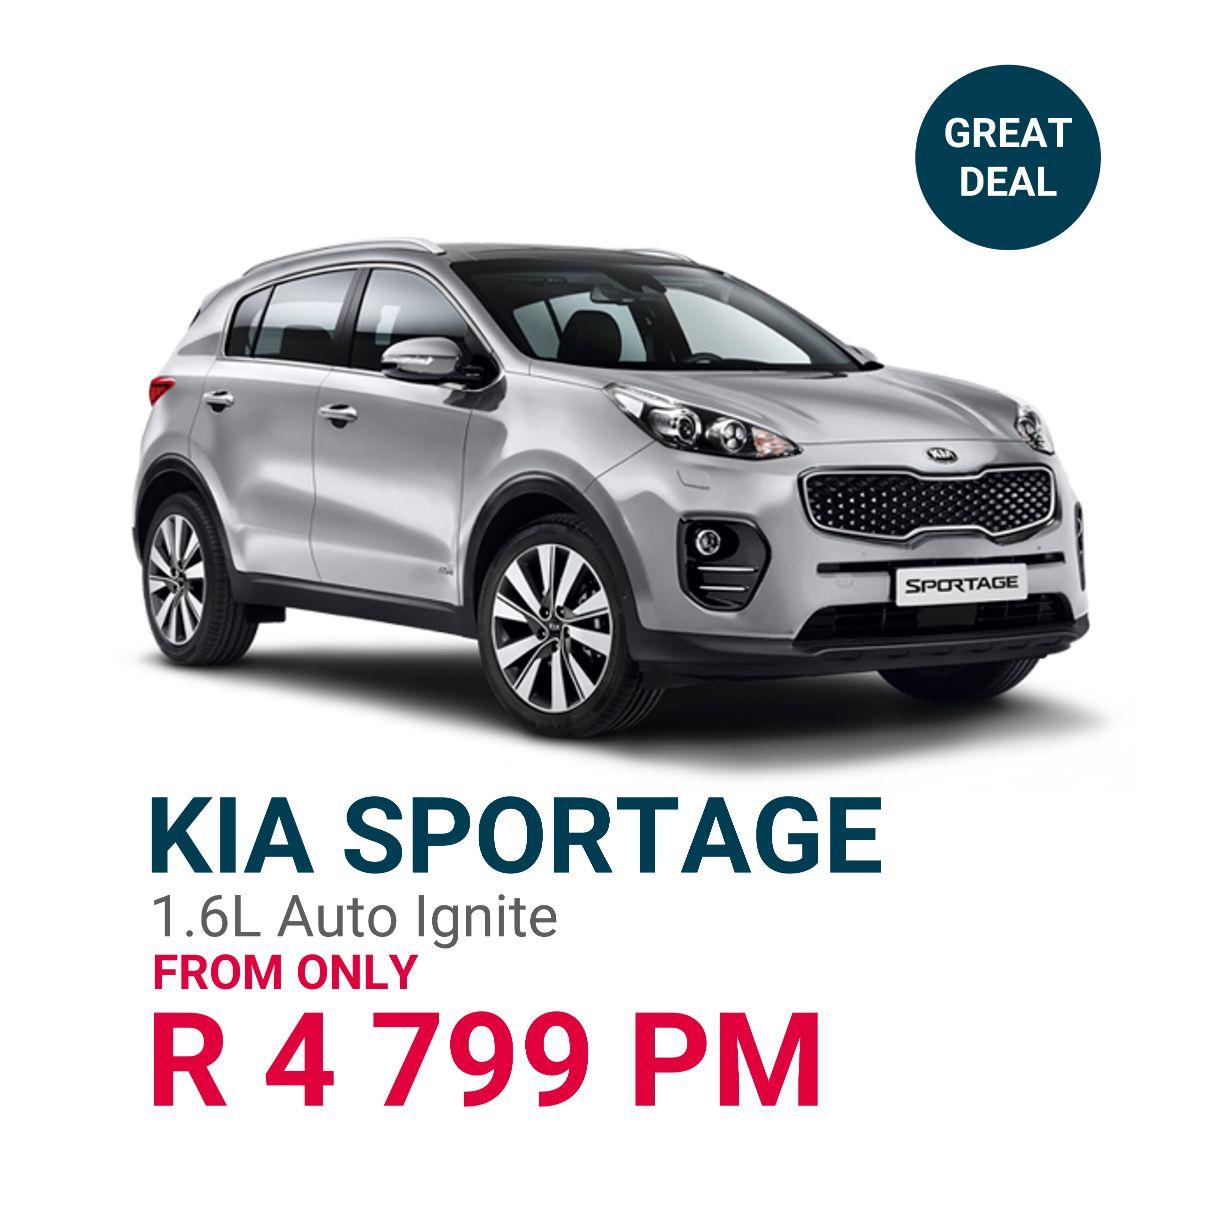 kia-sportage-1-6-auto-ignite-from-only-r4-799pm